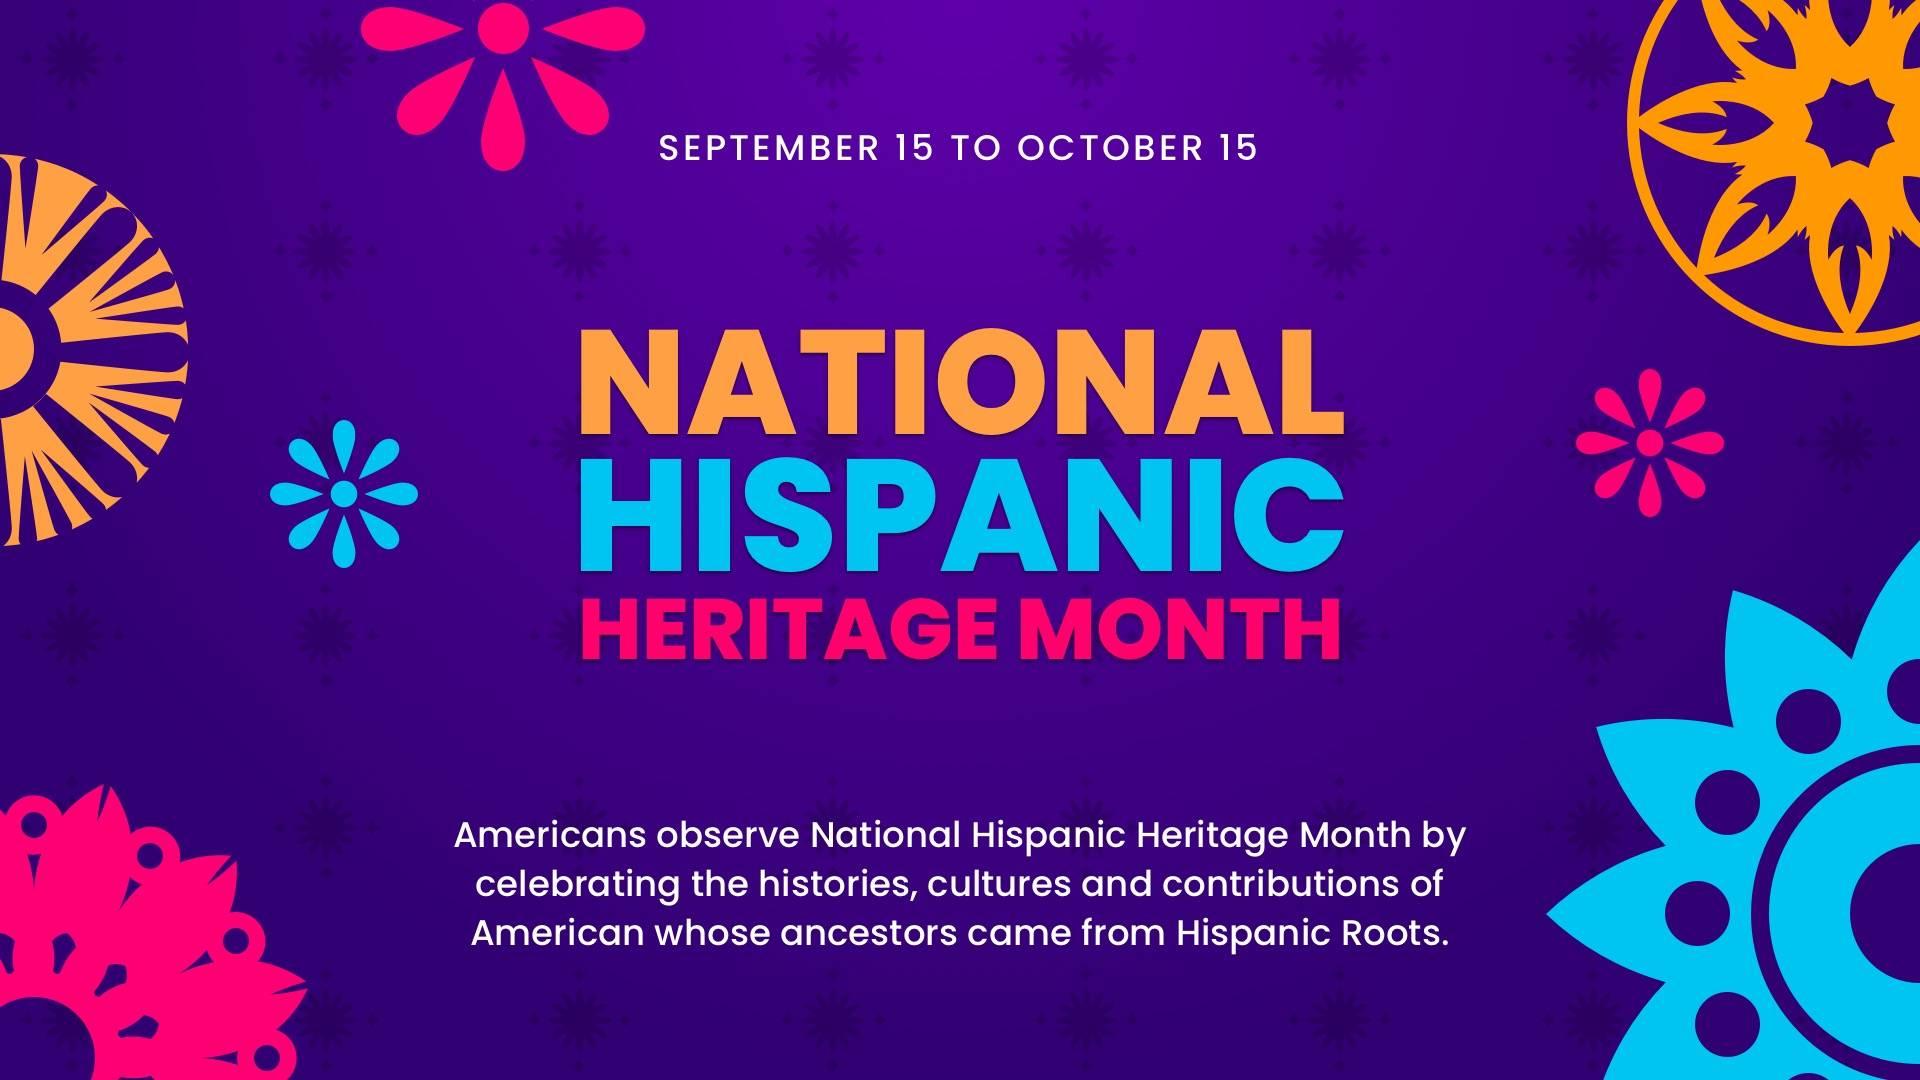 National Hispanic Heritage Month Digital Signage Template